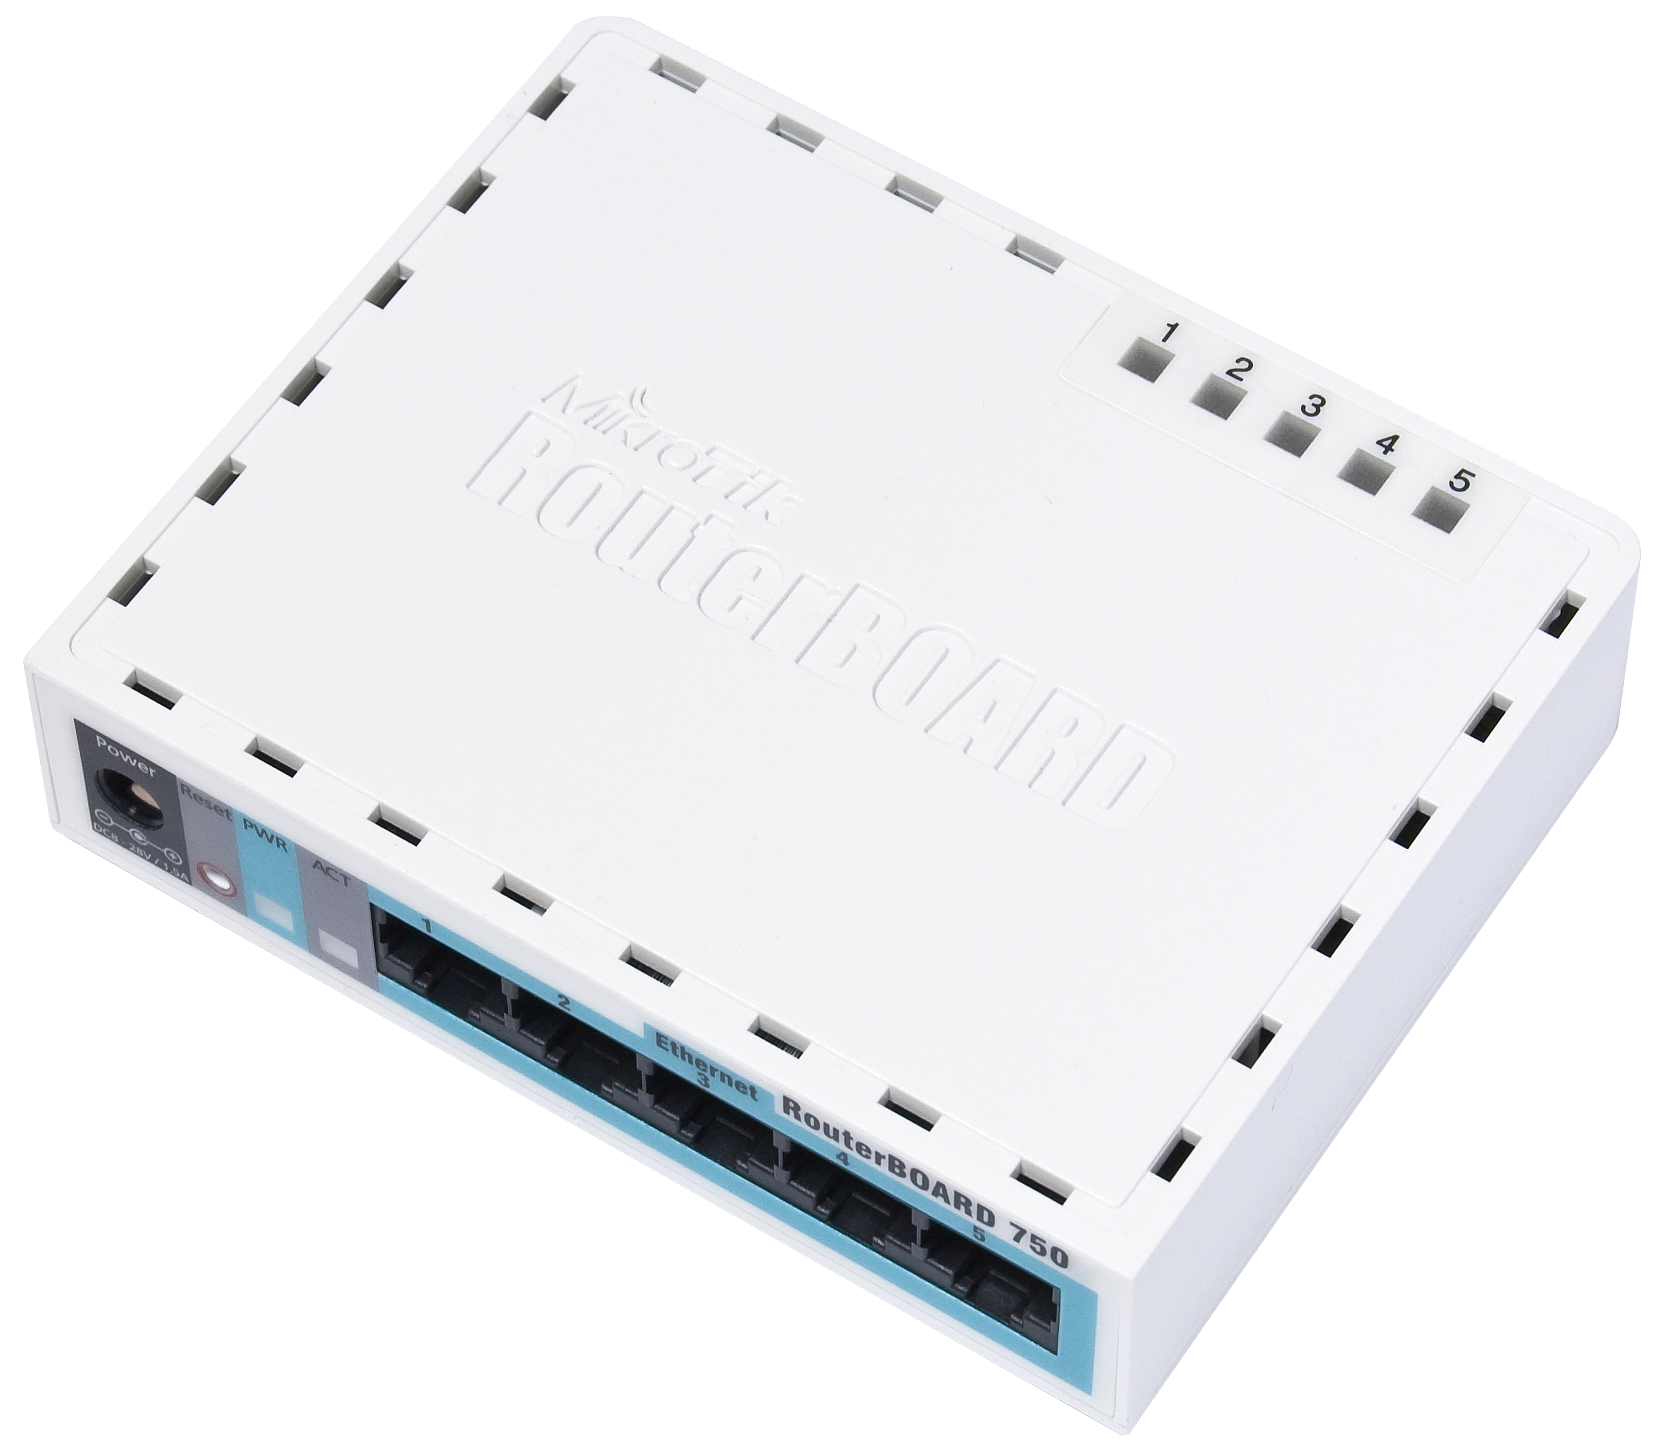 Купить Mikrotik wifi точку доступа по низкой цене в ...